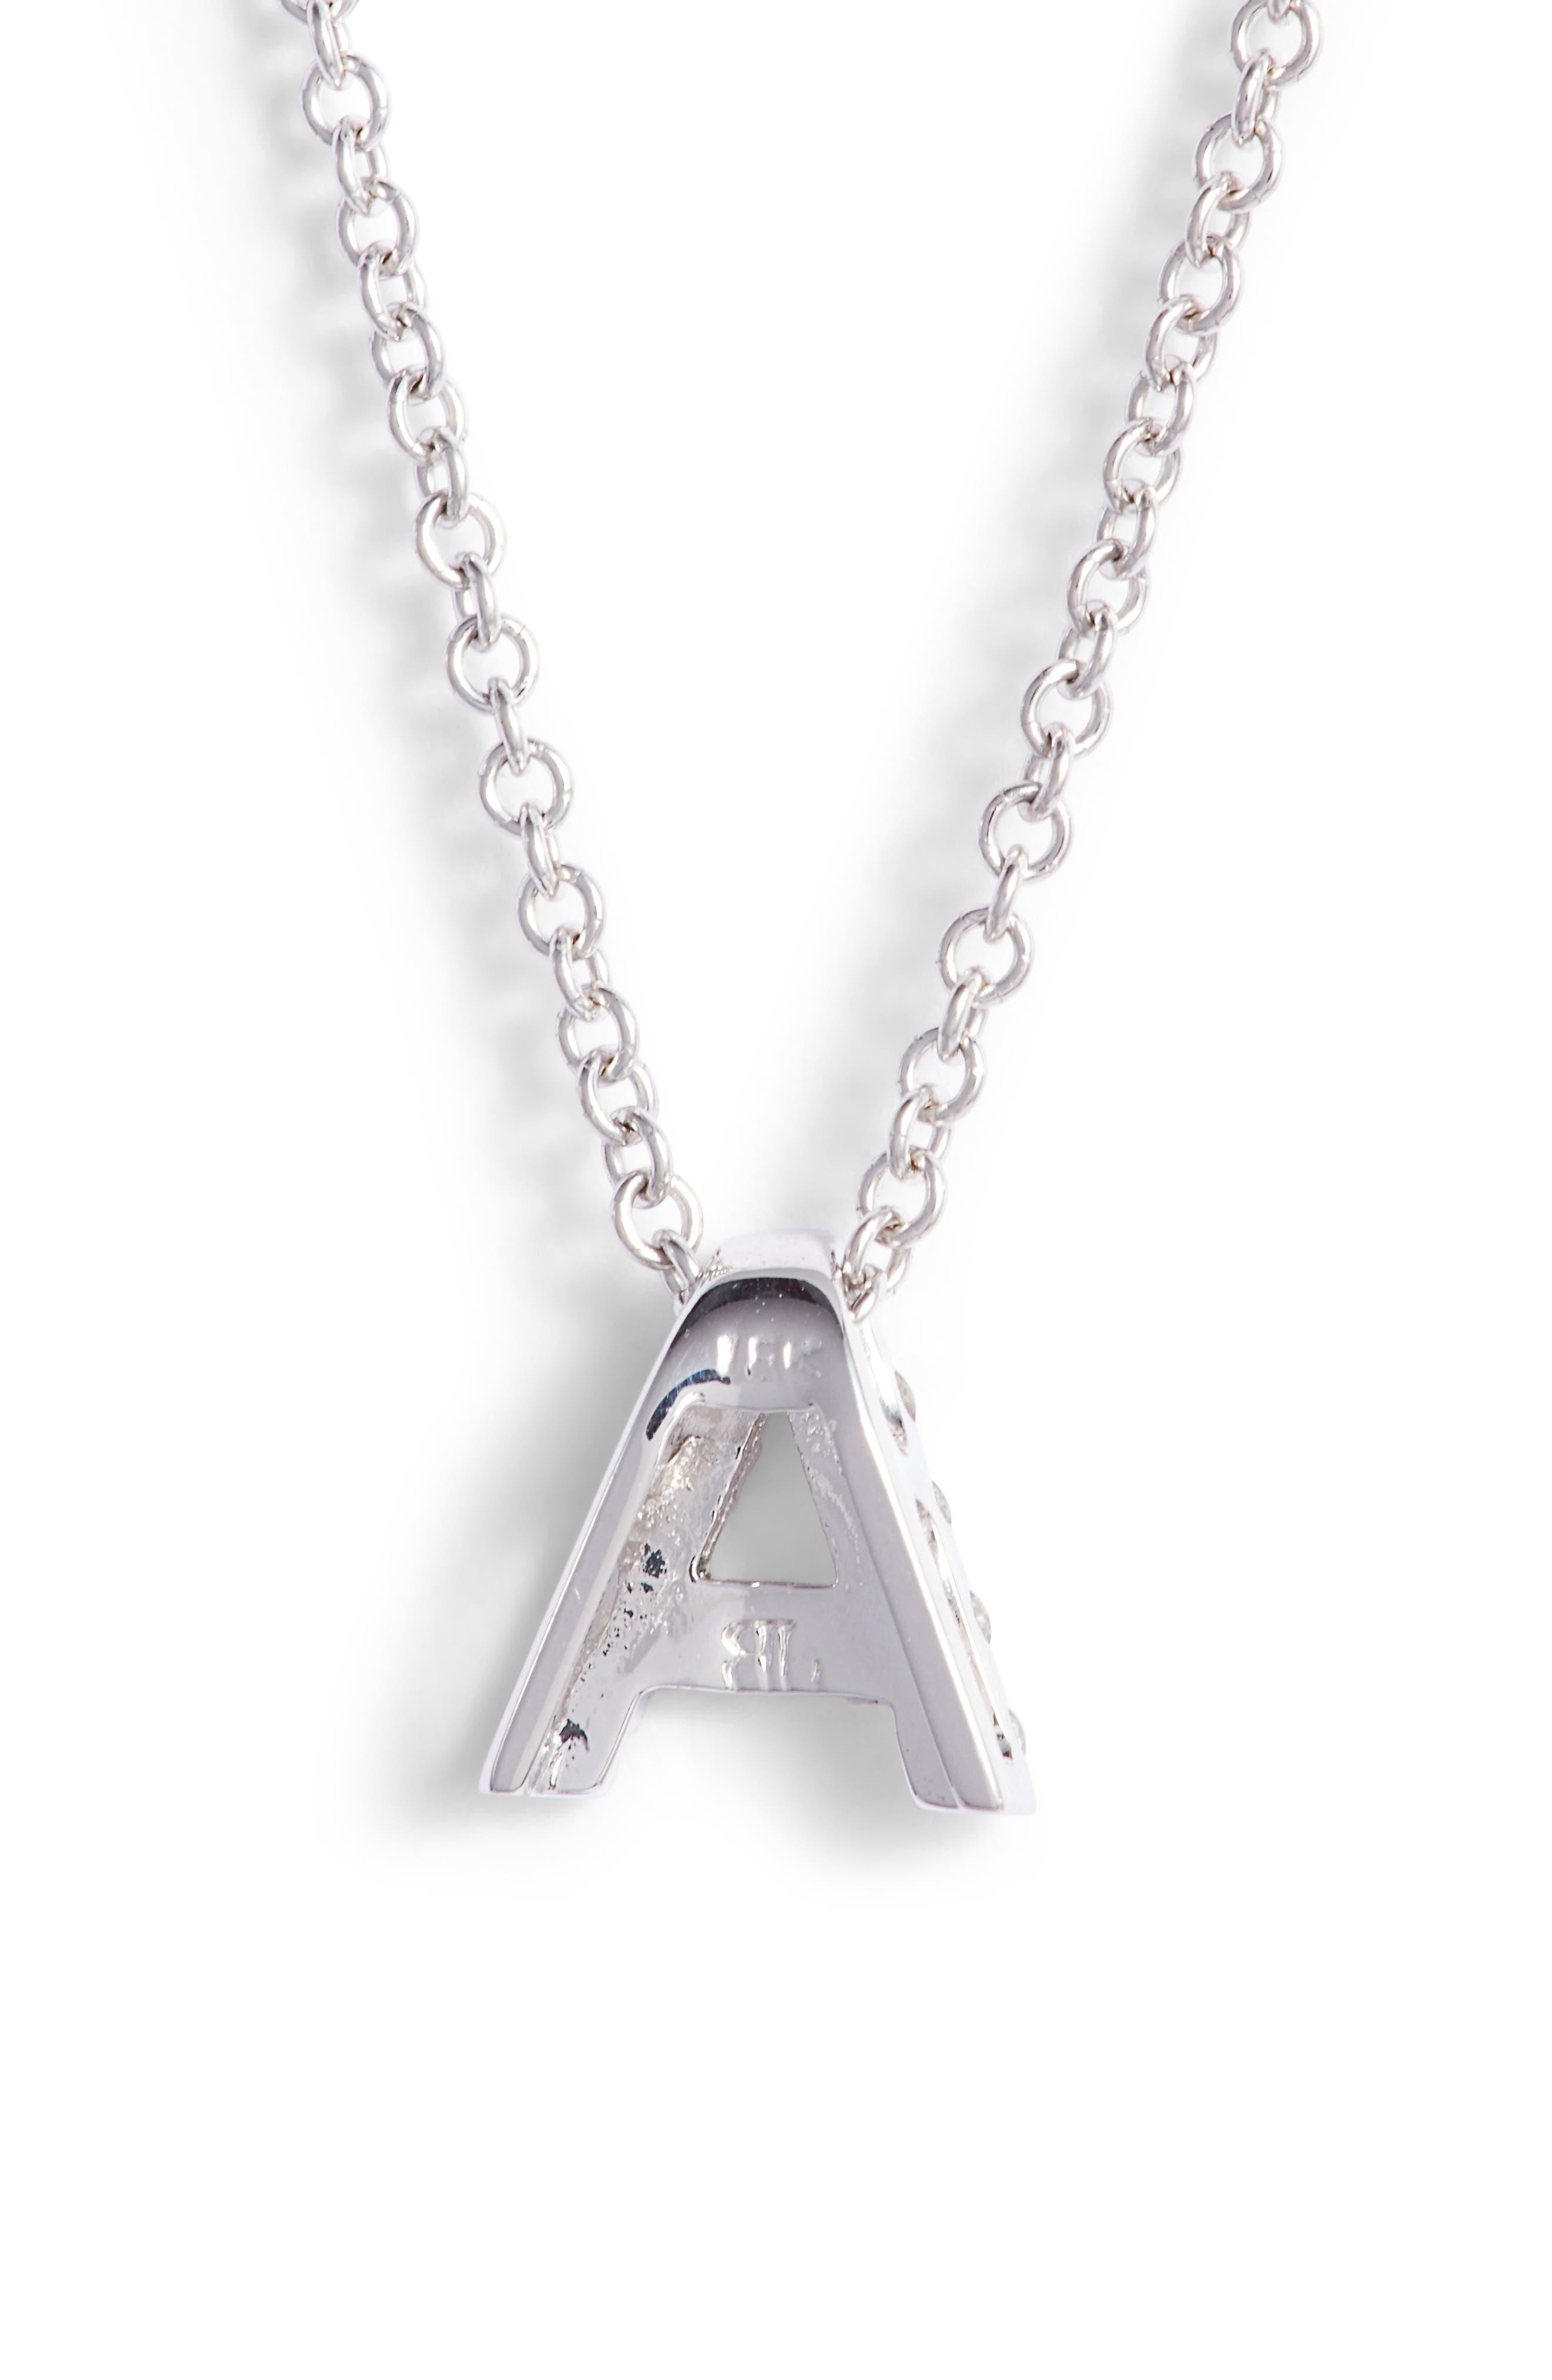 18k Gold Pavé Diamond Initial Pendant Necklace,                             Alternate thumbnail 4, color,                             White Gold - A